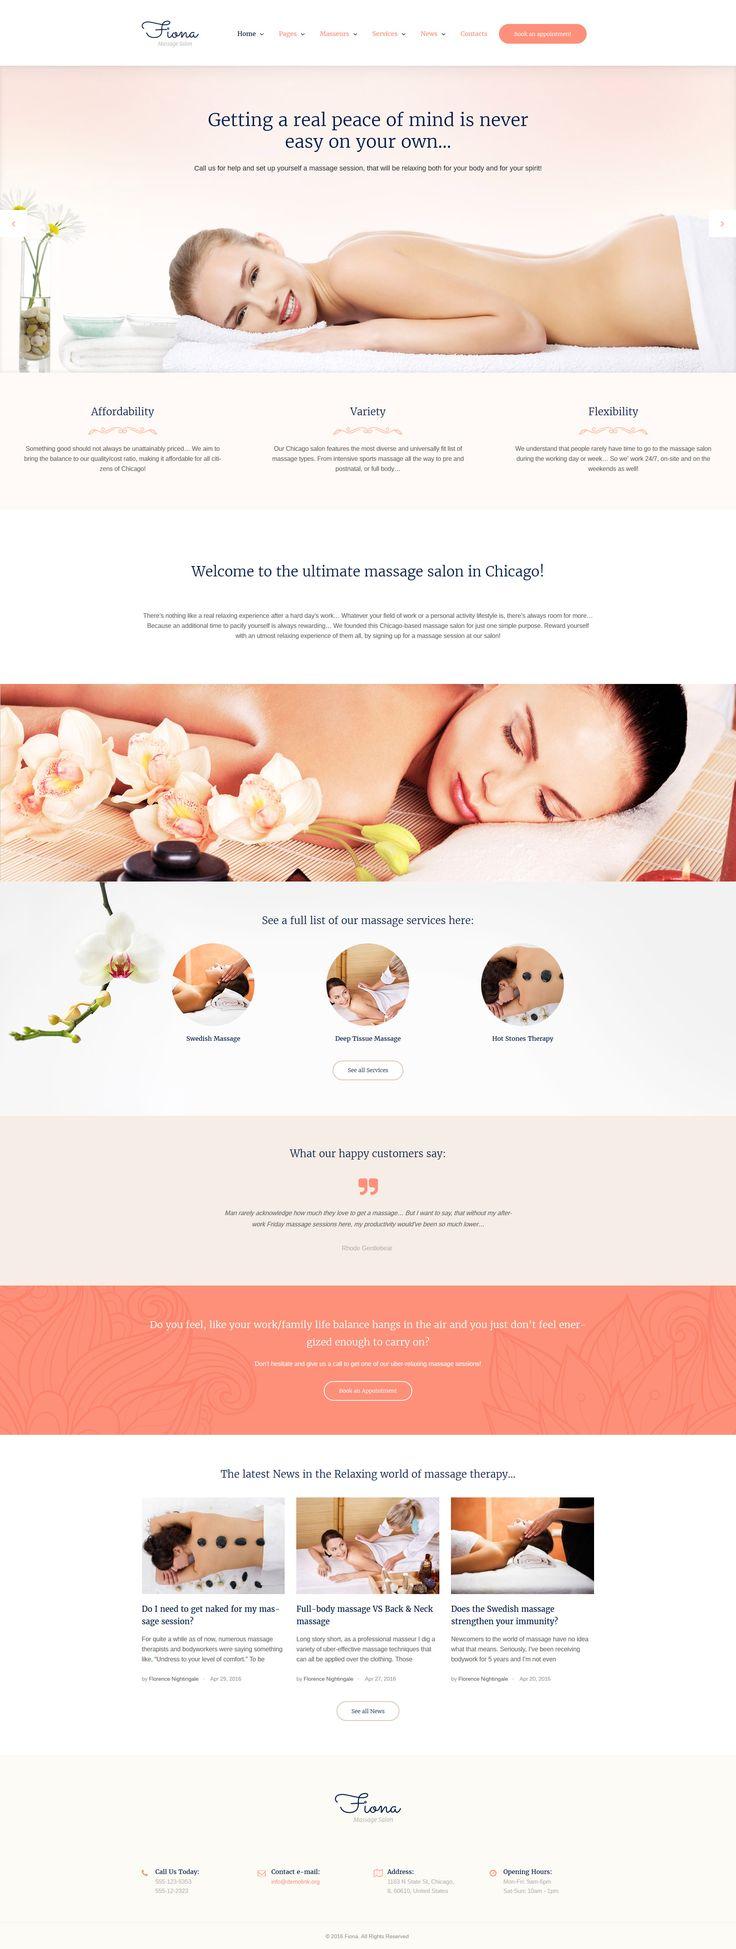 Massage Salon Responsive WordPress Theme http://www.templatemonster.com/wordpress-themes/massage-salon-responsive-wordpress-theme-58989.html